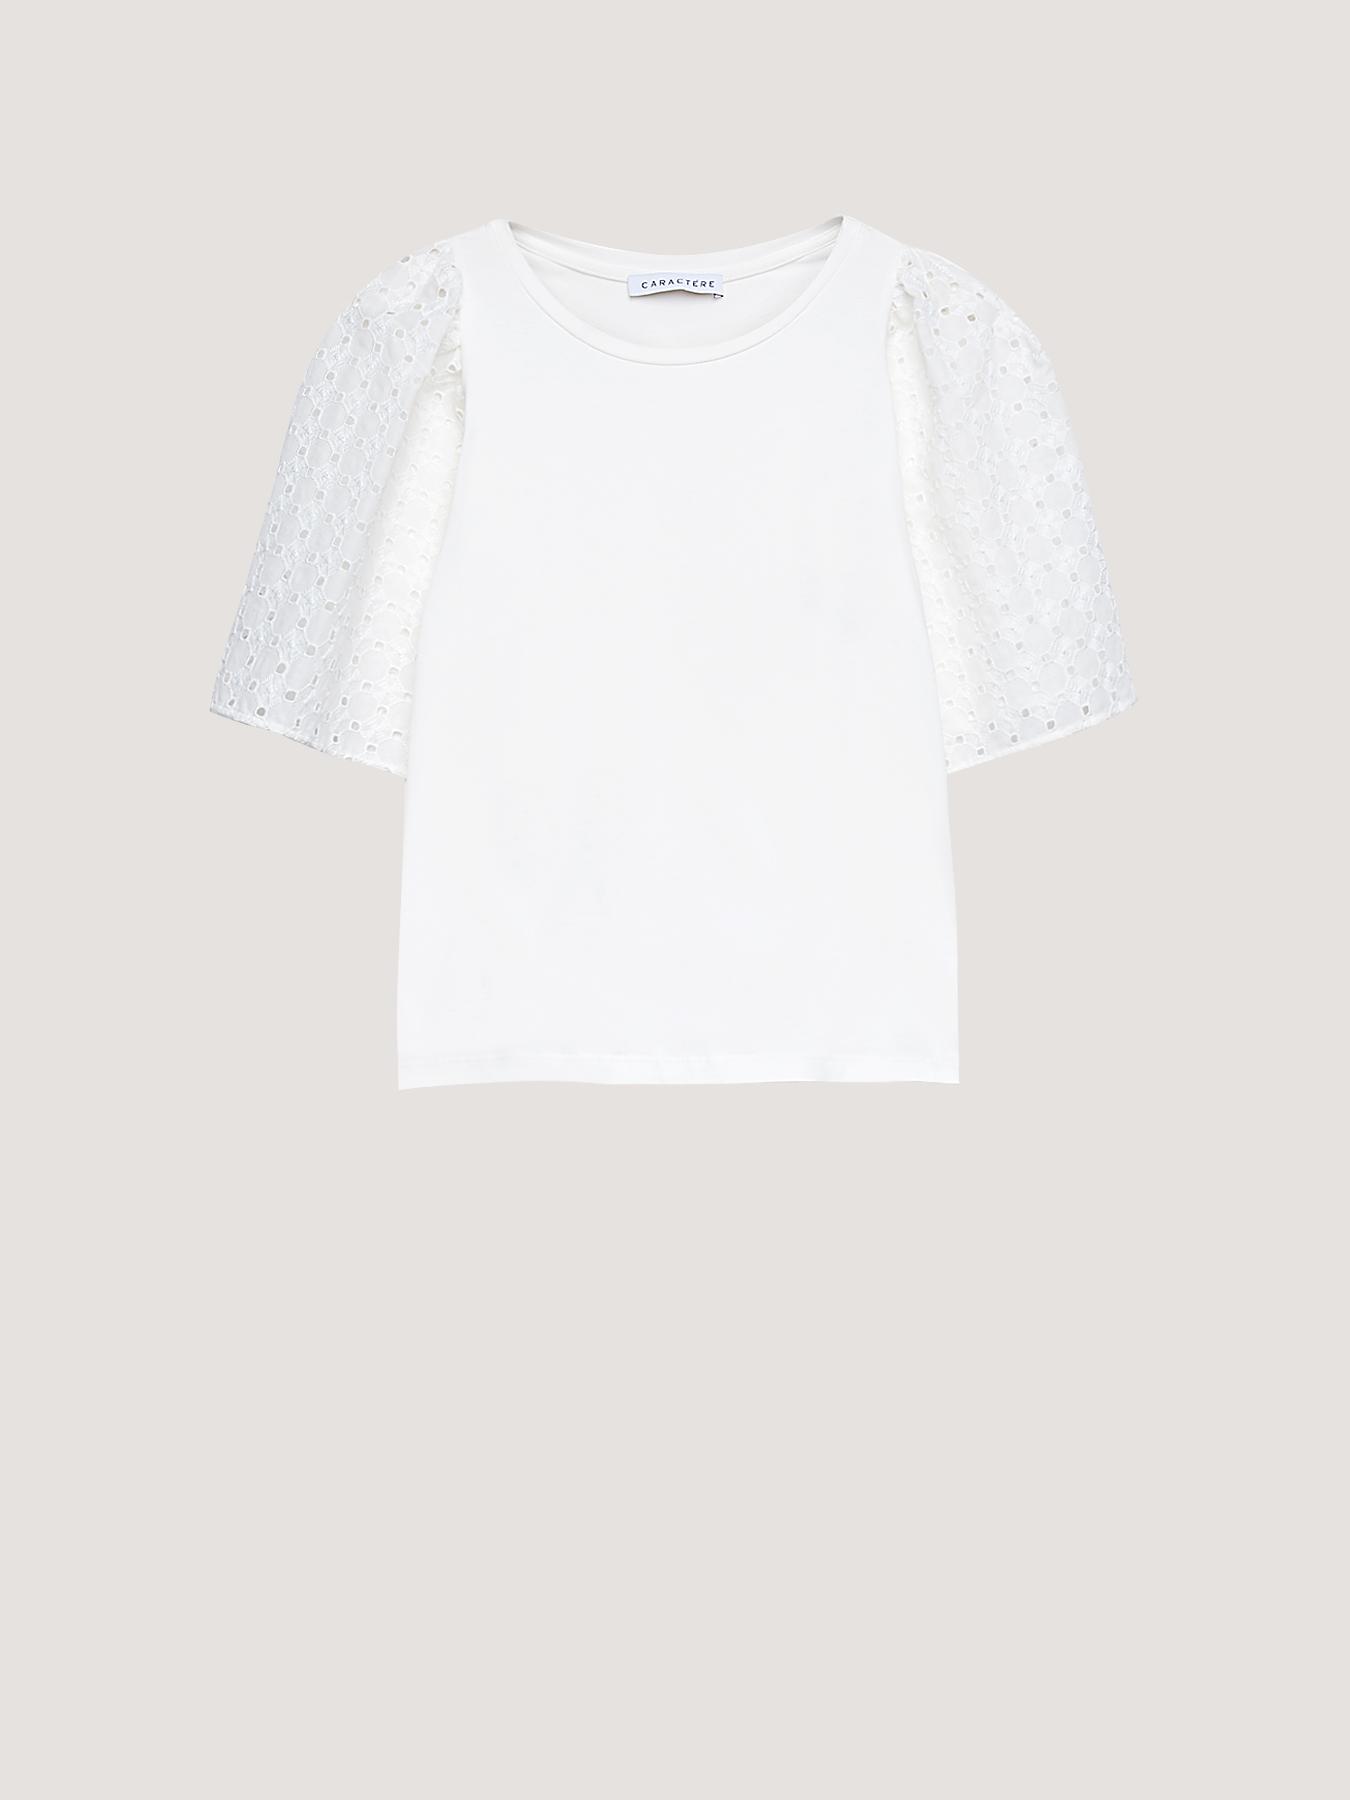 T-shirt boxy CARACTÈRE | T-shirt | G234D0930511